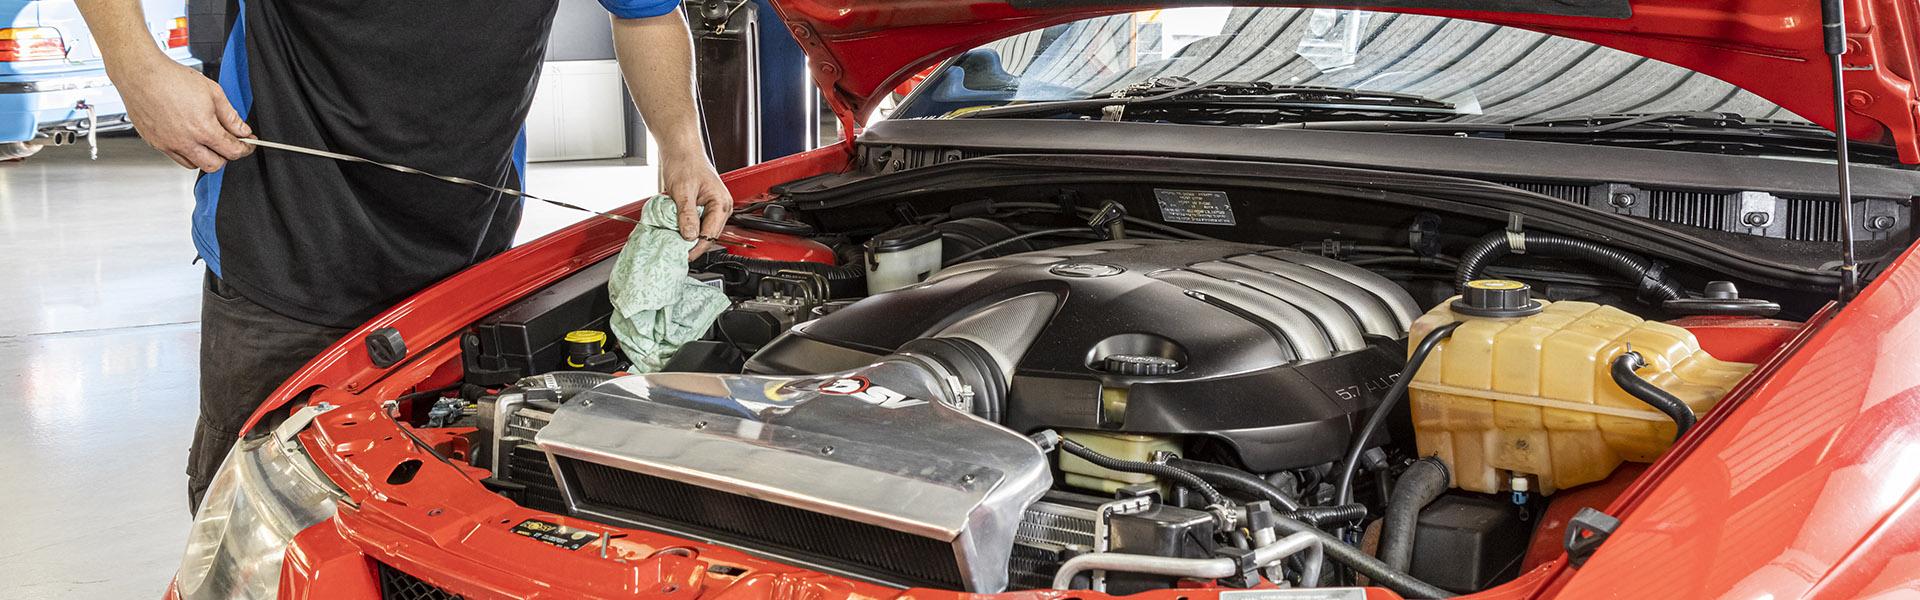 Mechanic and Car Servicing Gold Coast